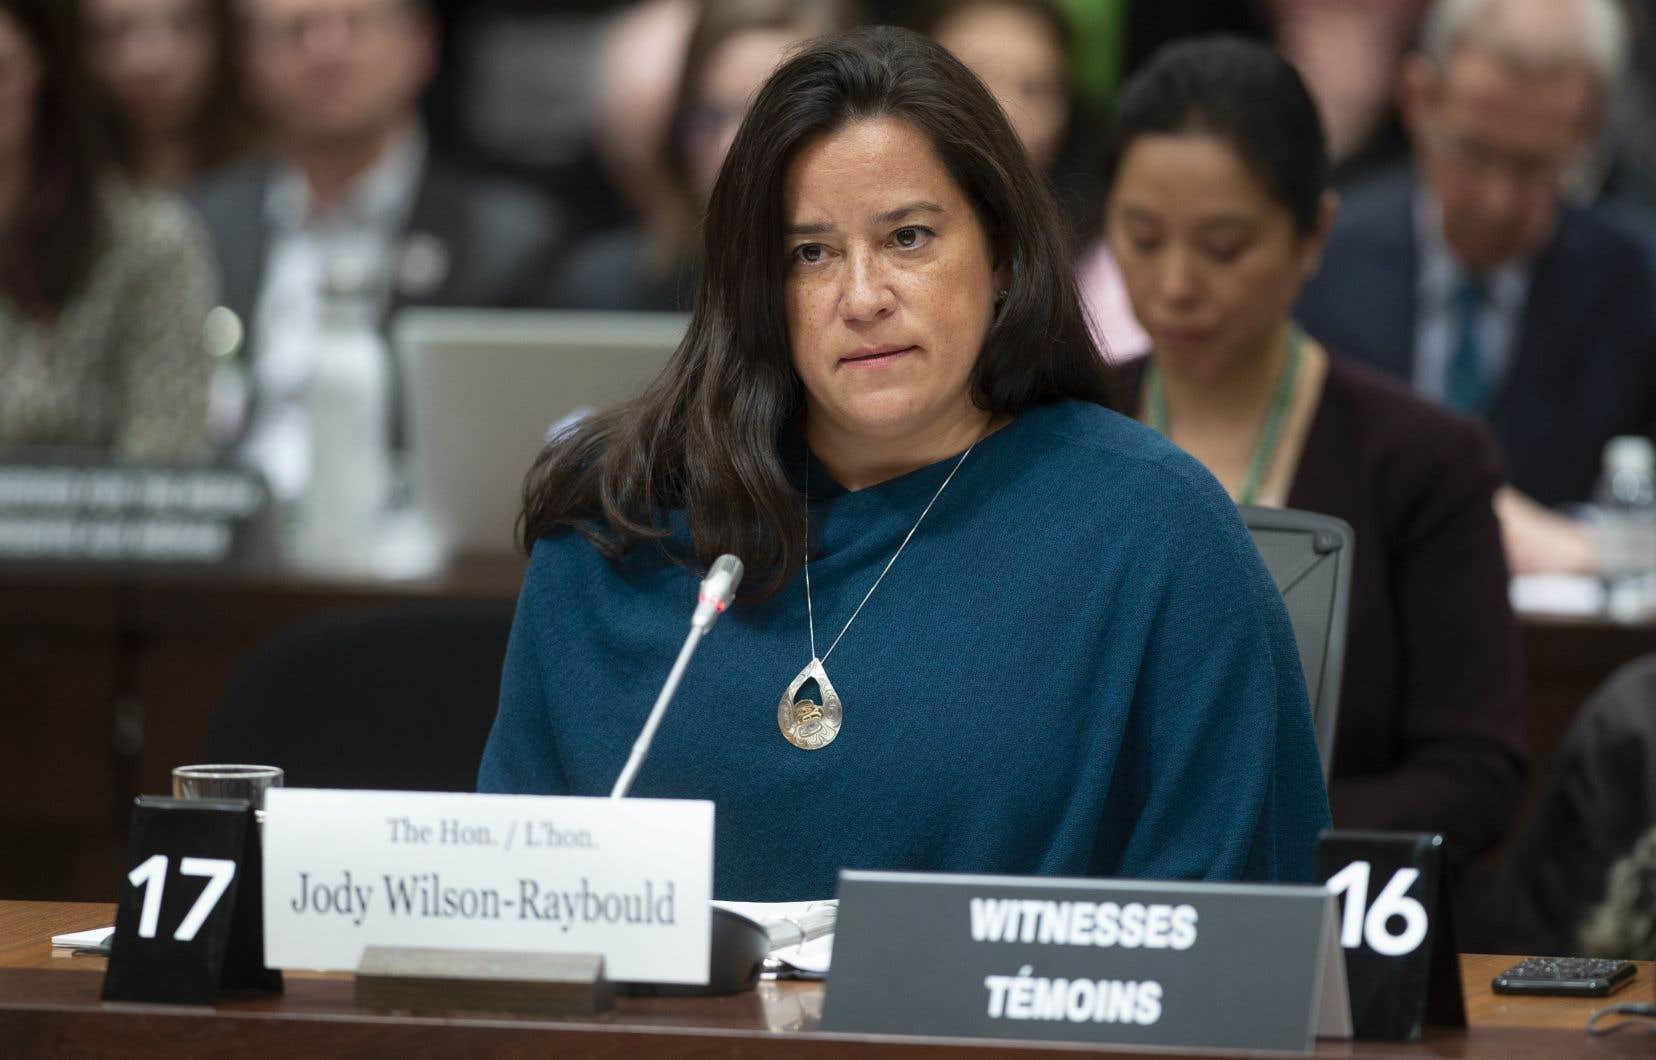 L'ex-ministre de la Justice, la libérale Jody Wilson-Raybould